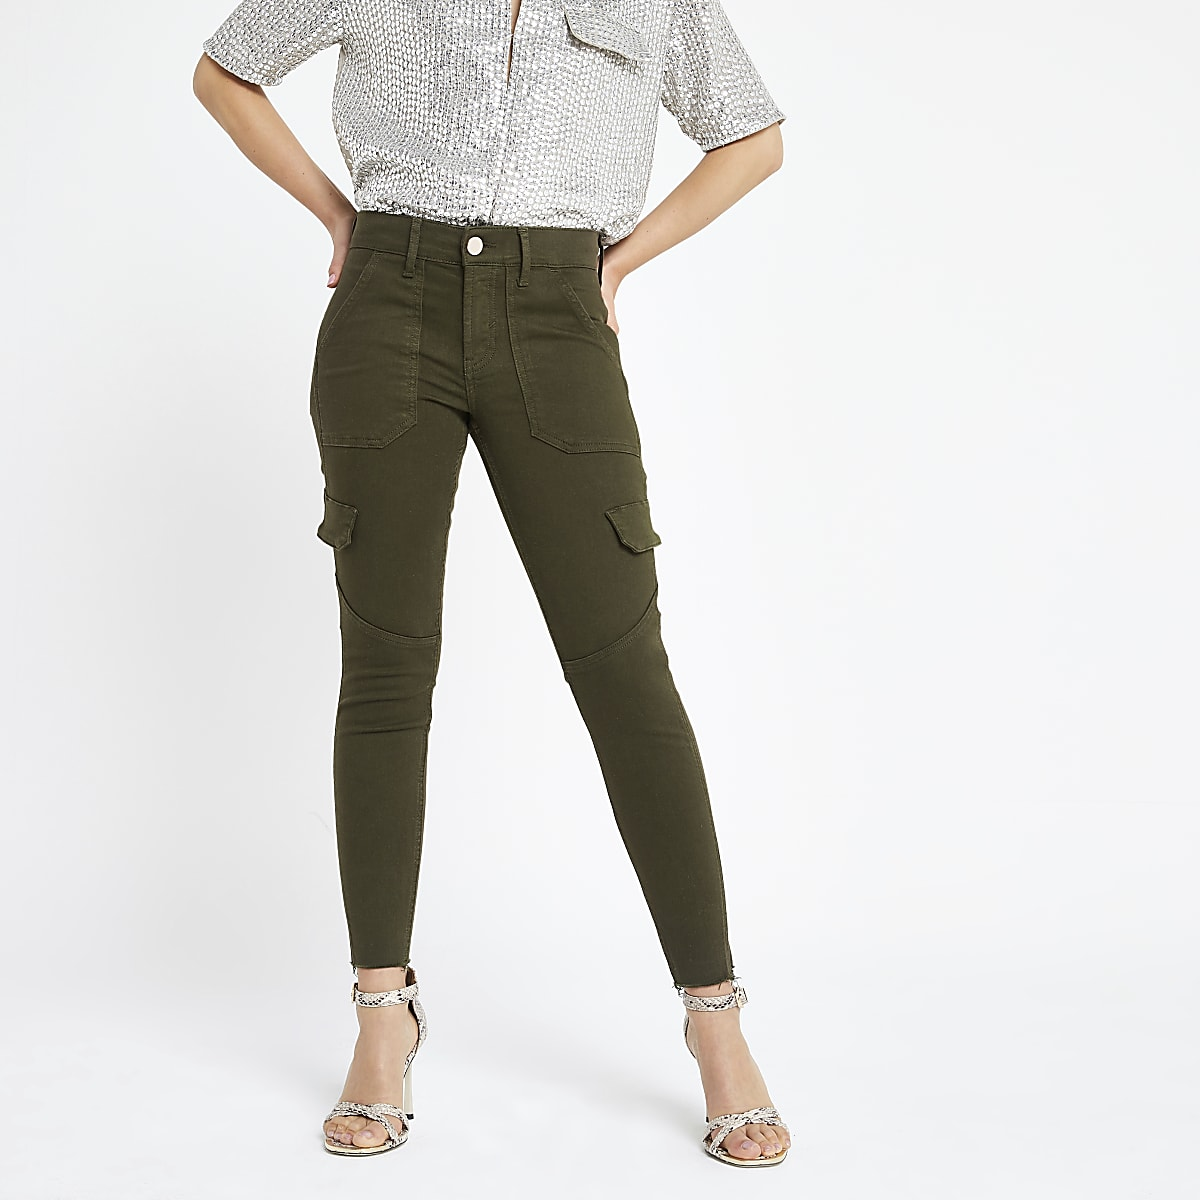 Petite khaki Amelie utility jeans